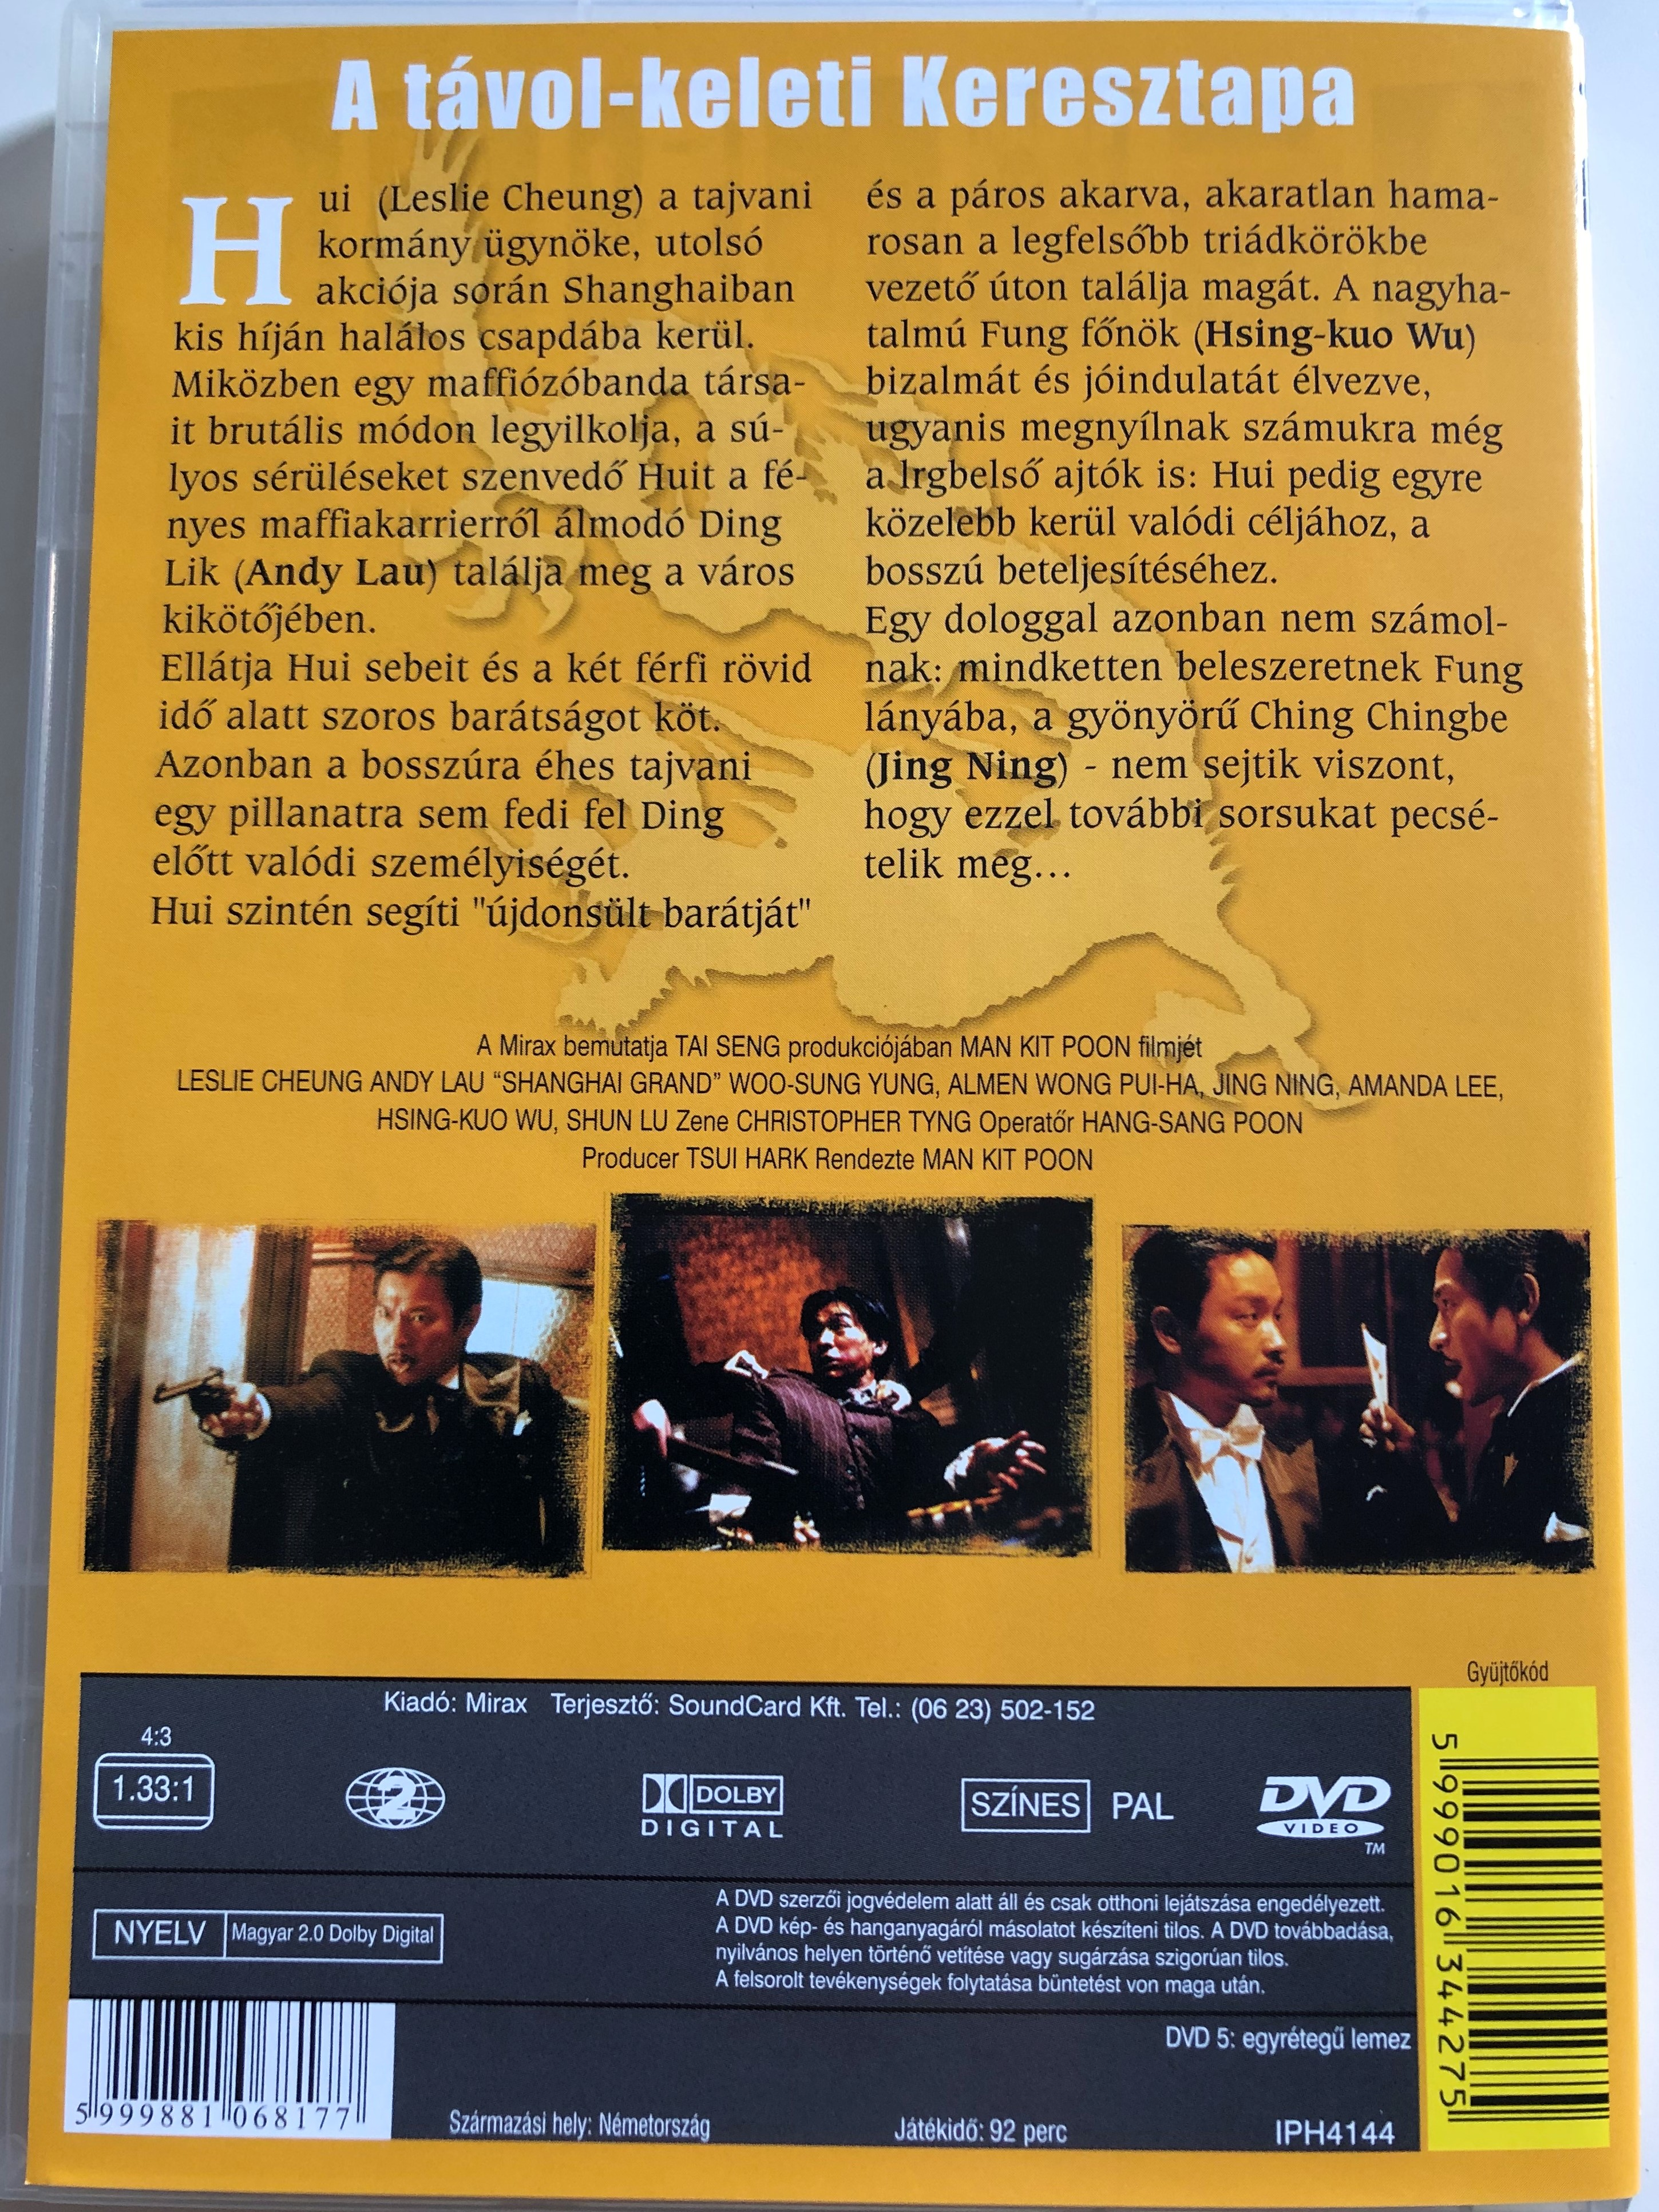 shanghai-grand-dvd-1996-lesz-mol-s-sanghajban-directed-by-man-kit-poon-starring-andy-lau-leslie-cheung-ning-jing-san-seong-hoi-taan-2-.jpg